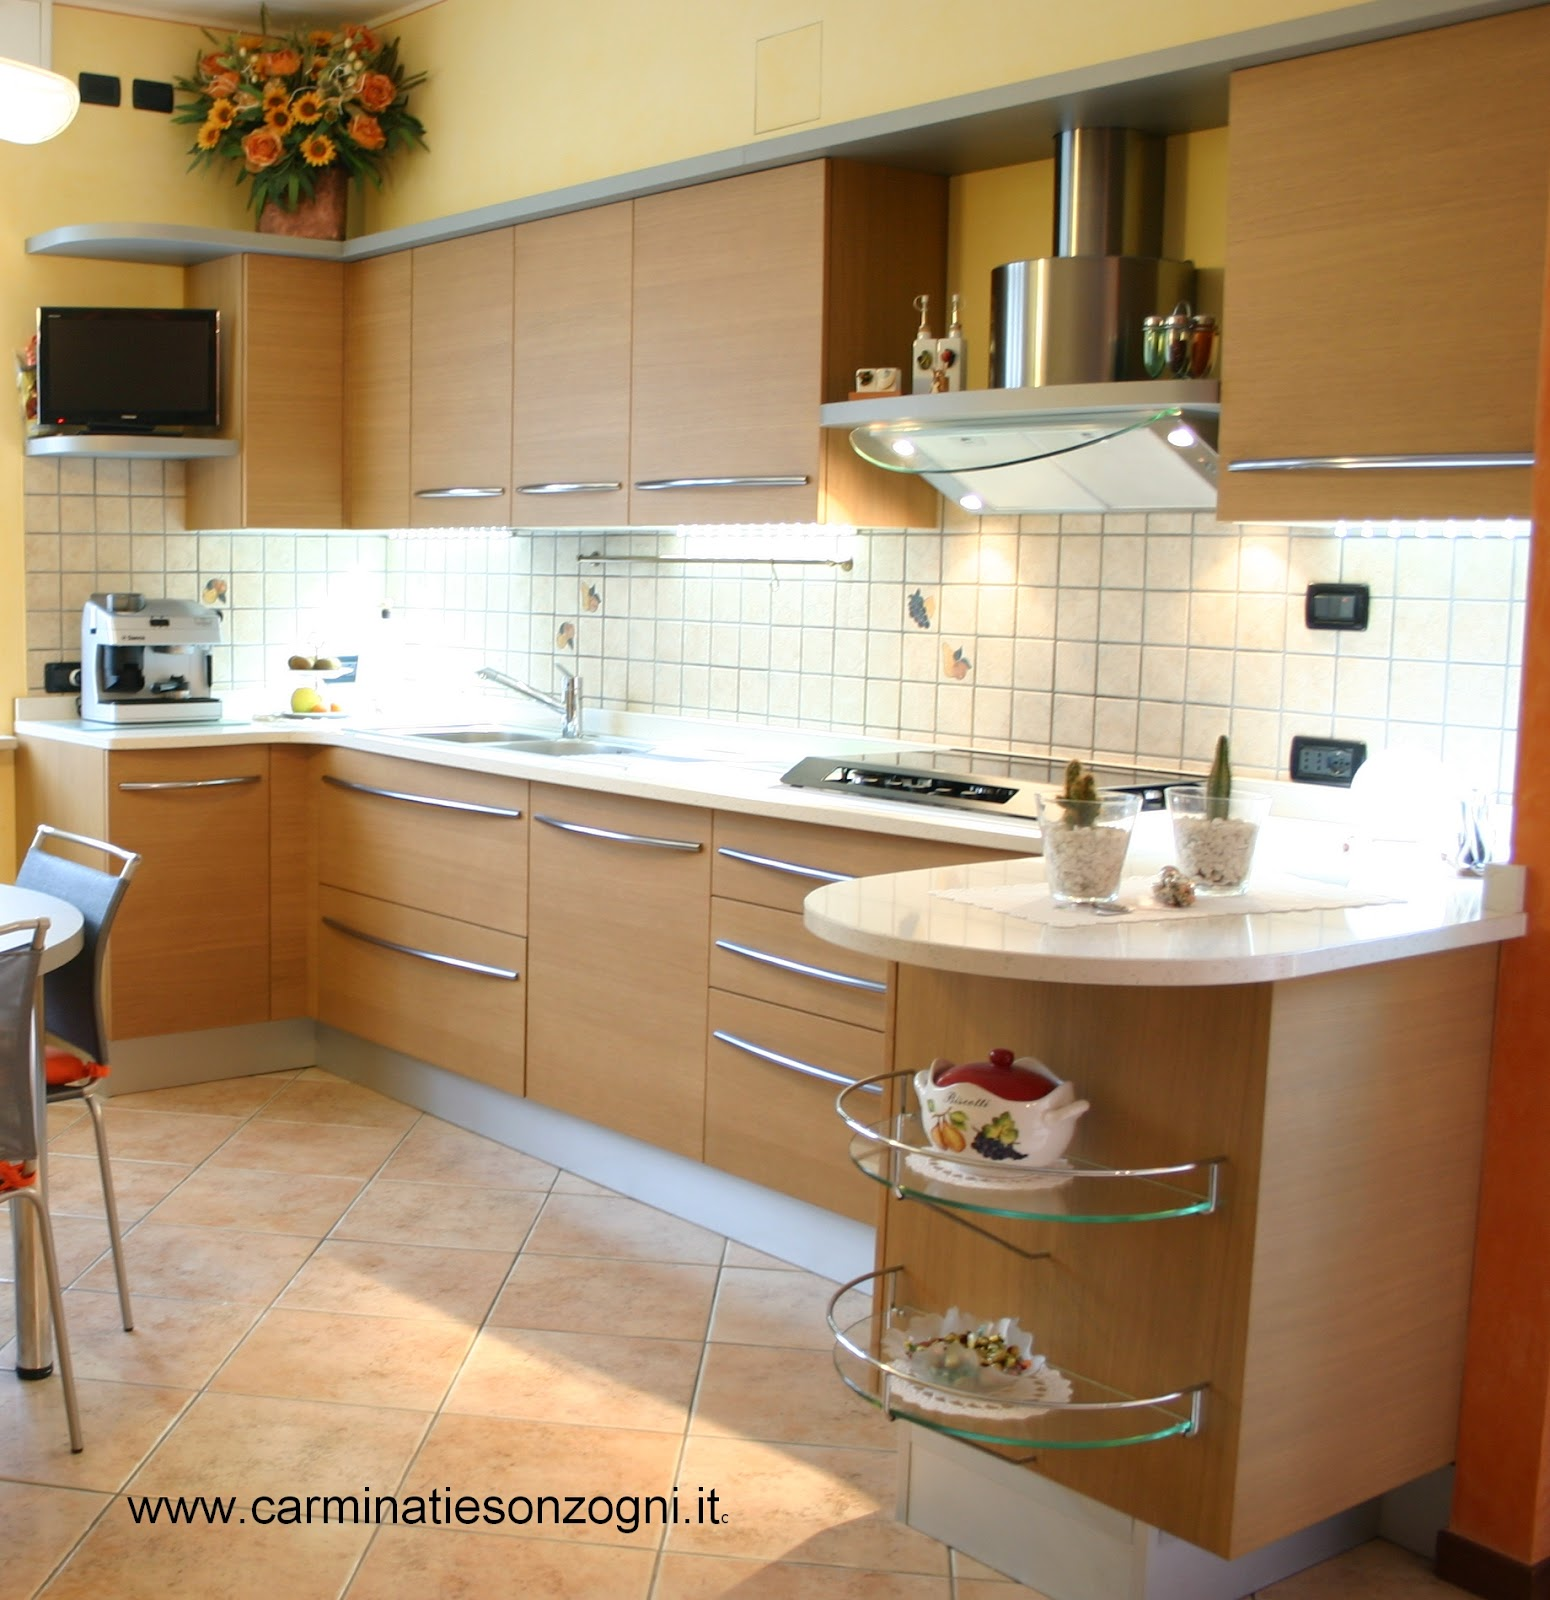 foto cucina Skyline Snaidero, in provincia di Bergamo, Lombardia, penisola zona ingresso  .jpg